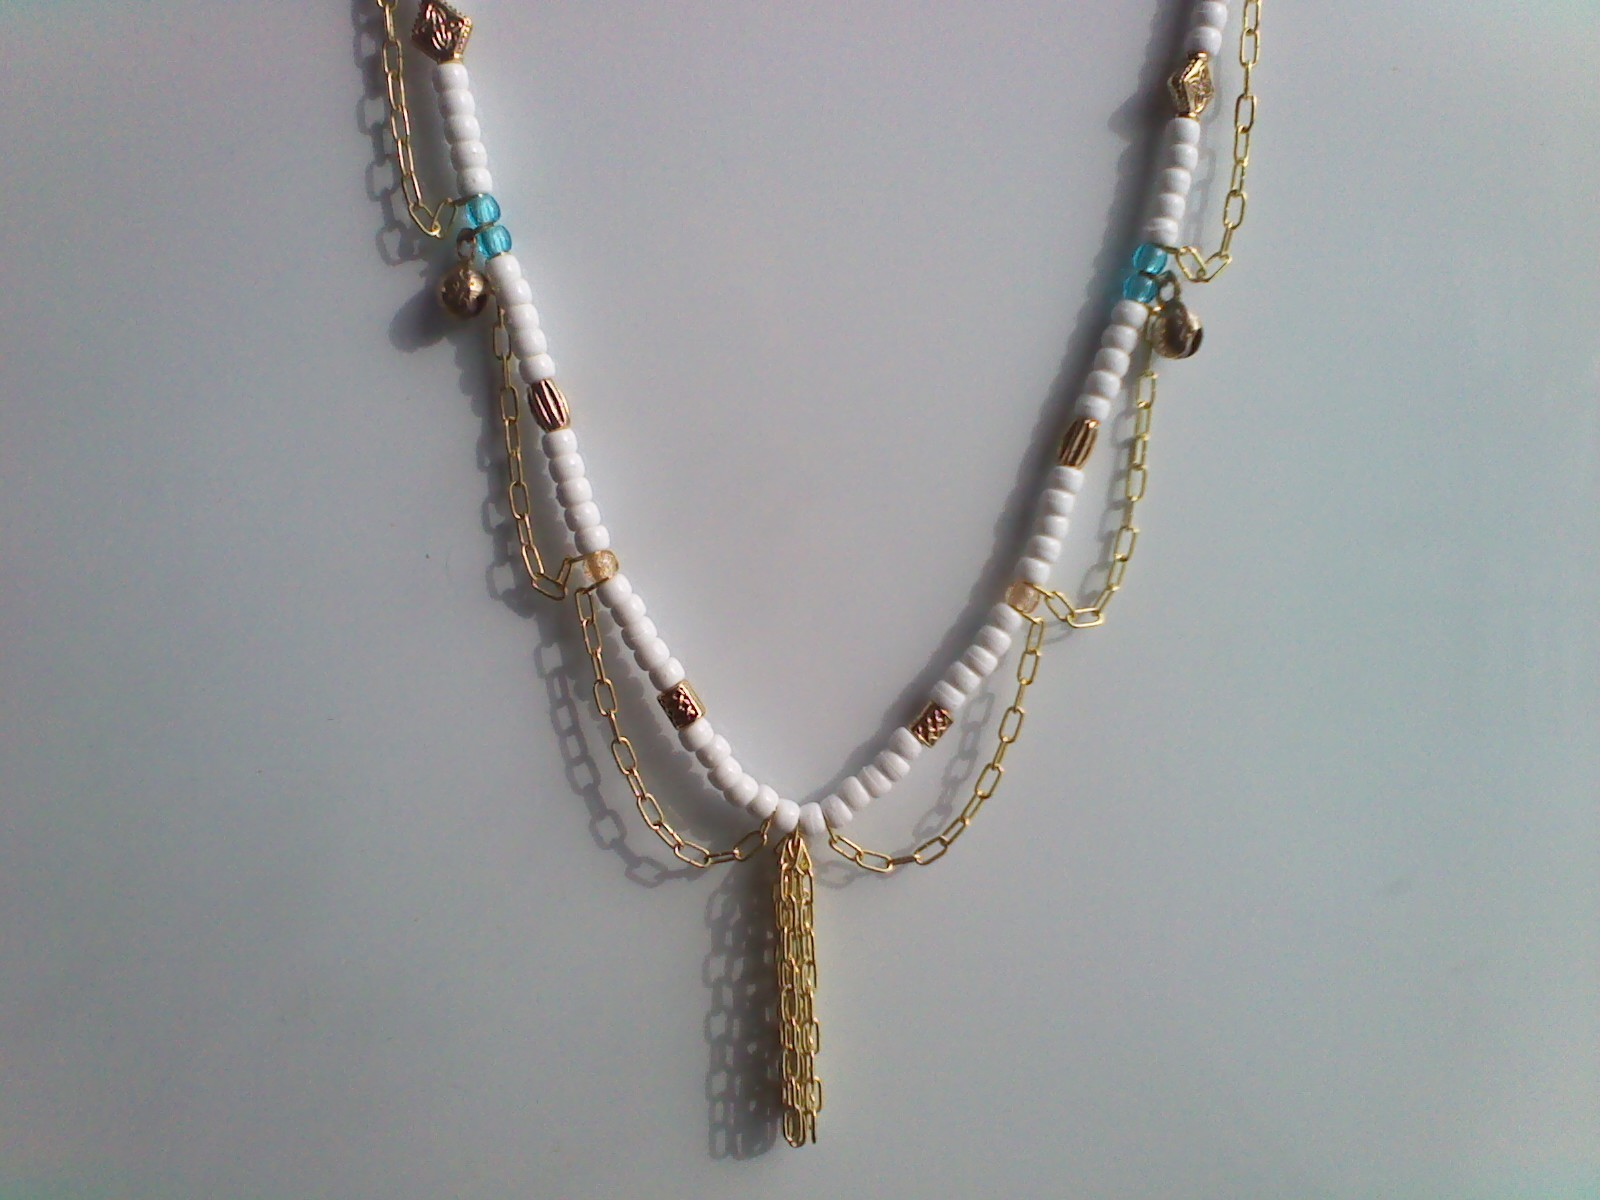 Spirit horse rhythm beads